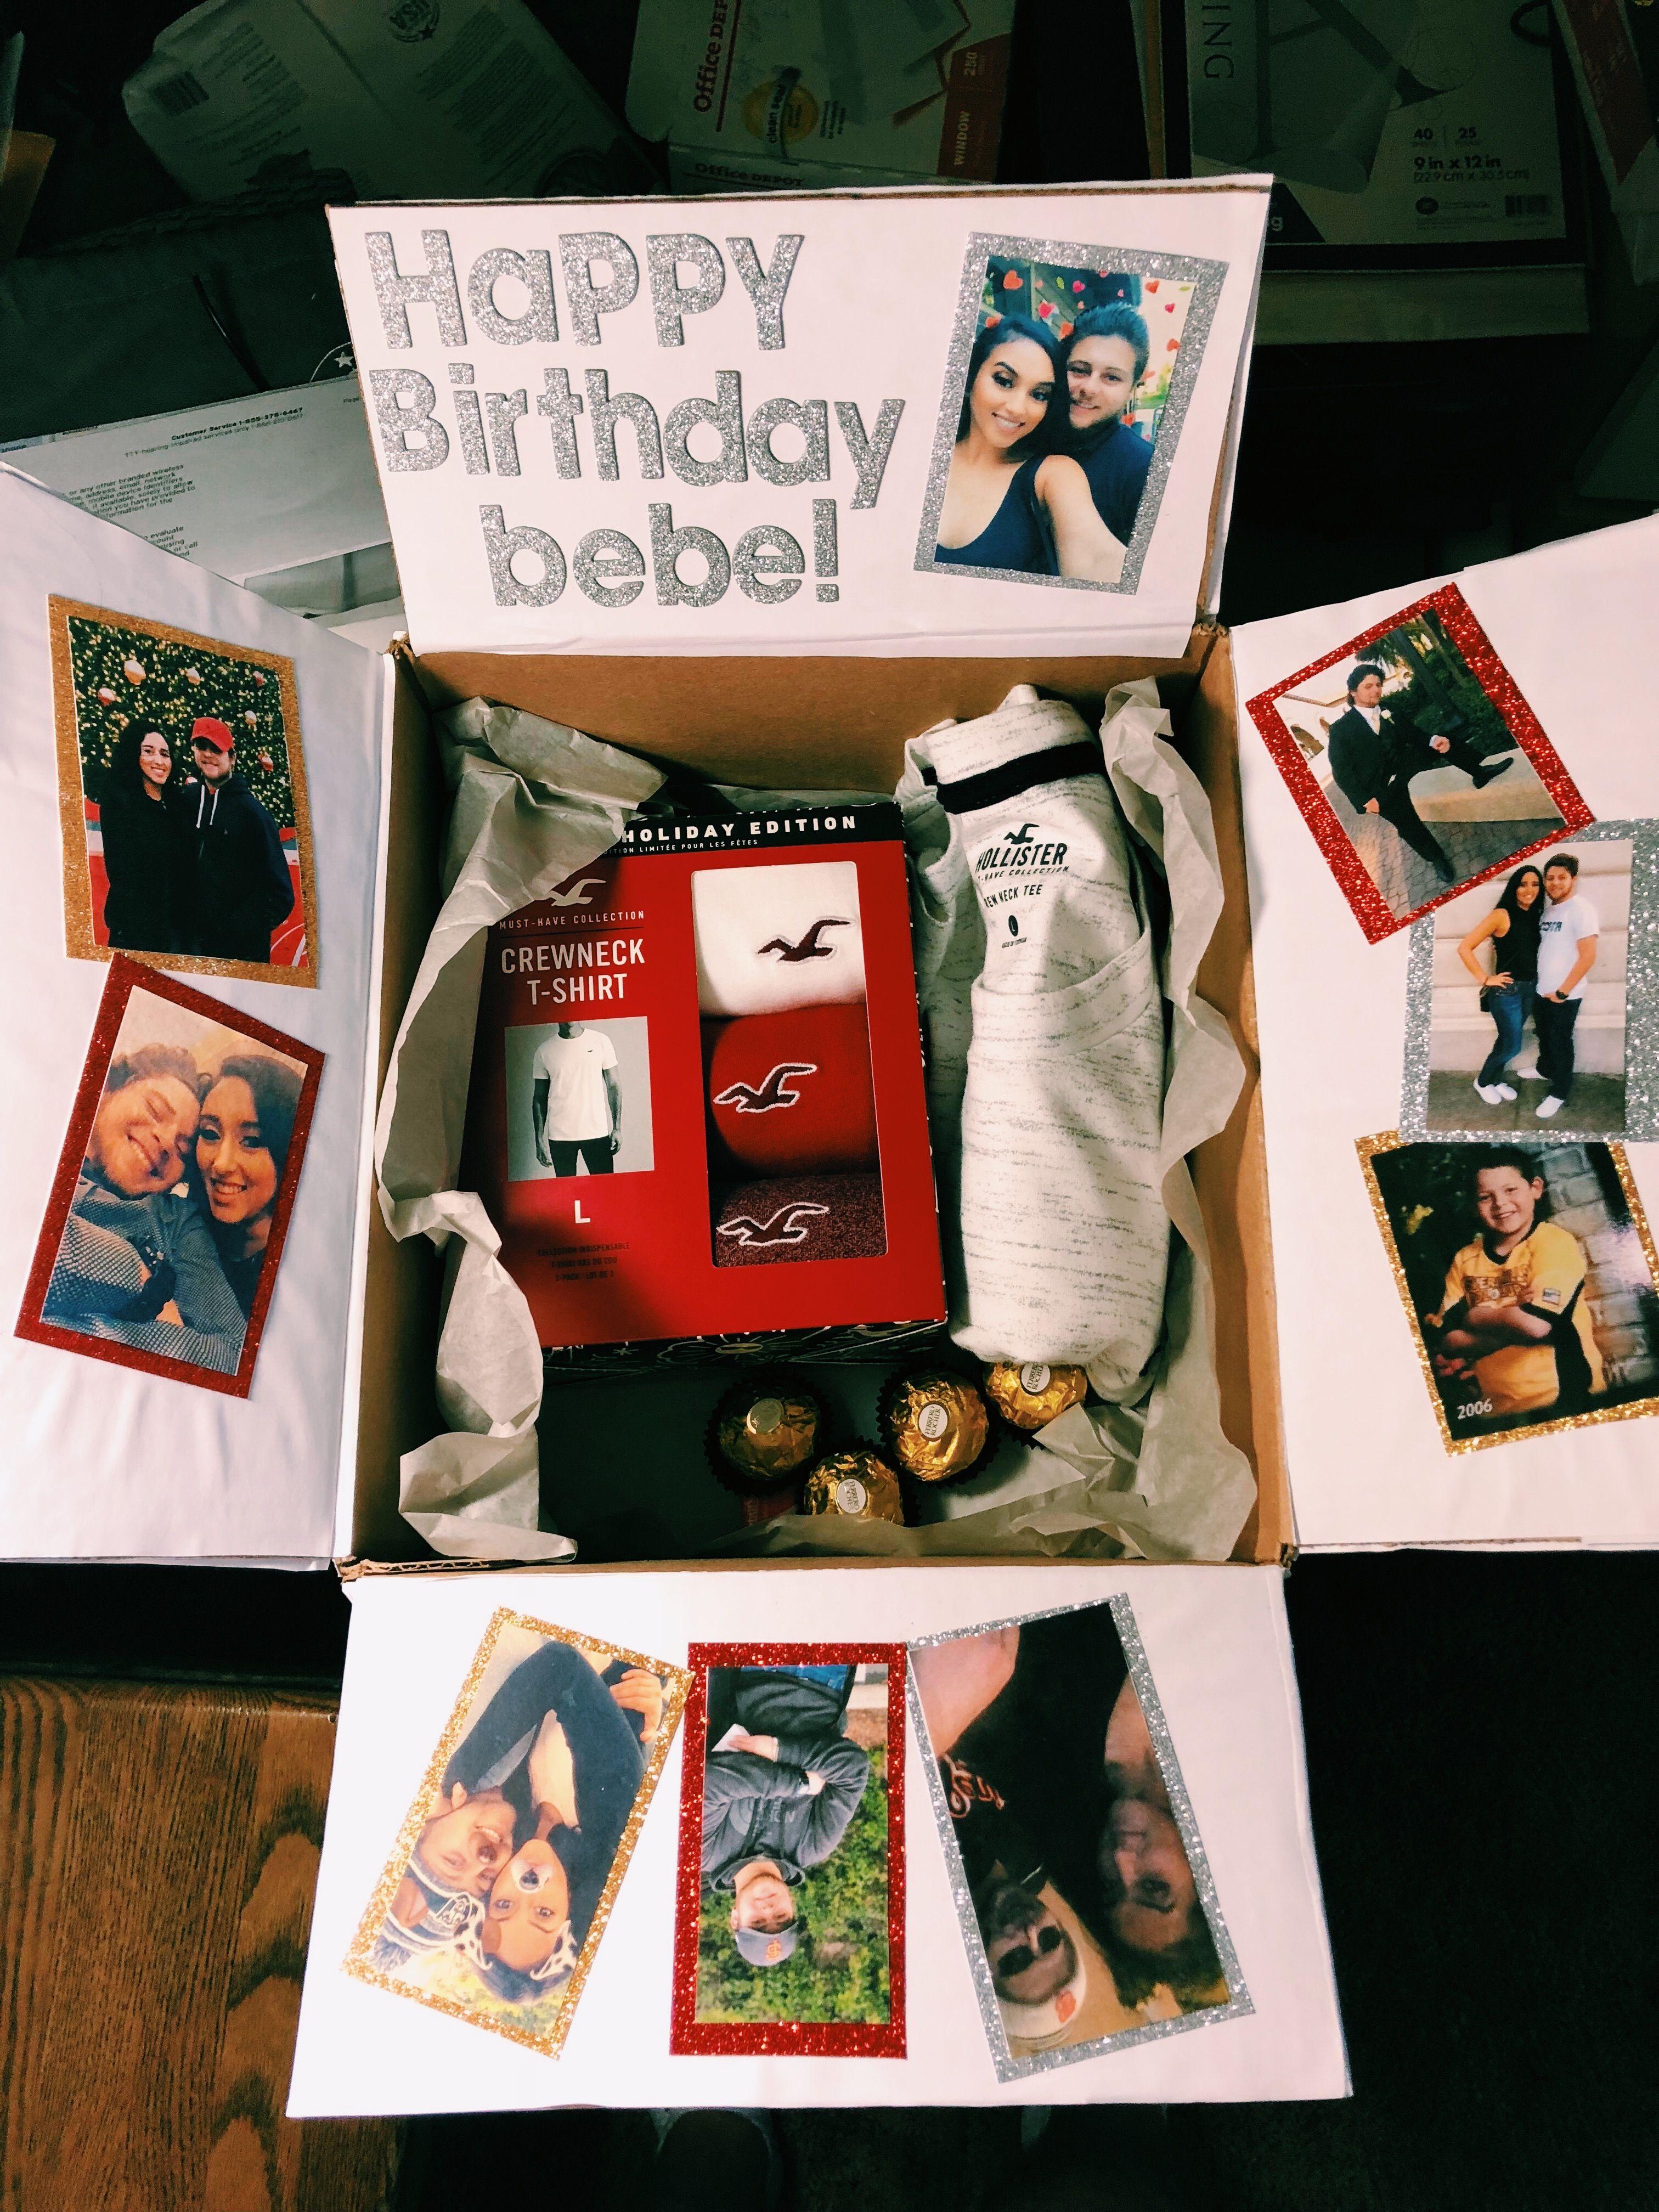 Silver 'Sling' Sandals   Birthday gifts for boyfriend diy